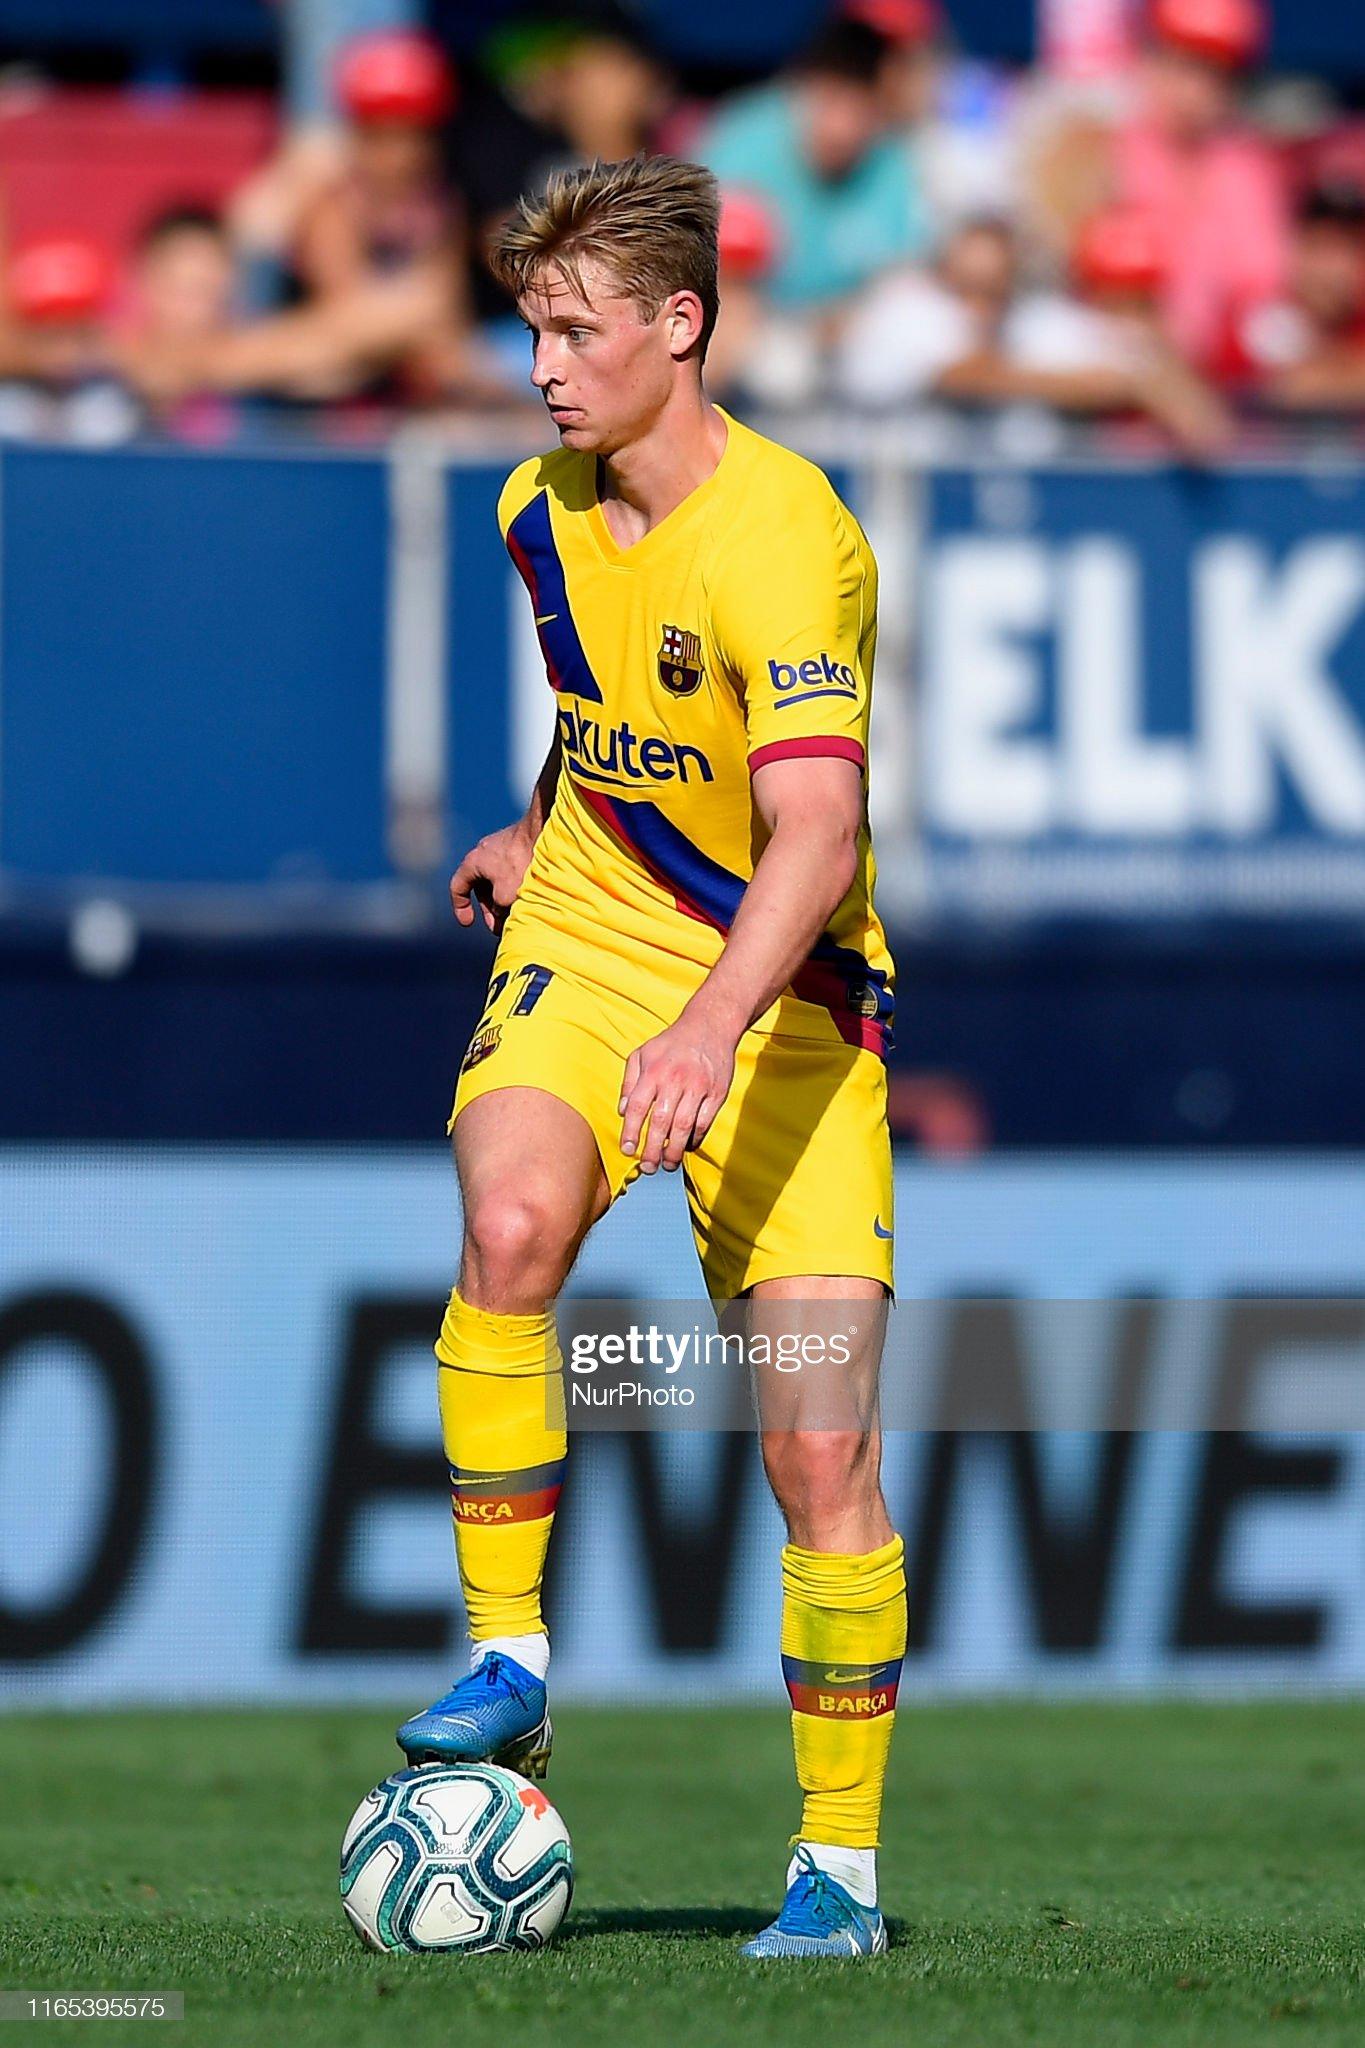 صور مباراة : أوساسونا - برشلونة 2-2 ( 31-08-2019 )  Frenkie-de-jong-of-barcelona-controls-the-ball-during-the-liga-match-picture-id1165395575?s=2048x2048